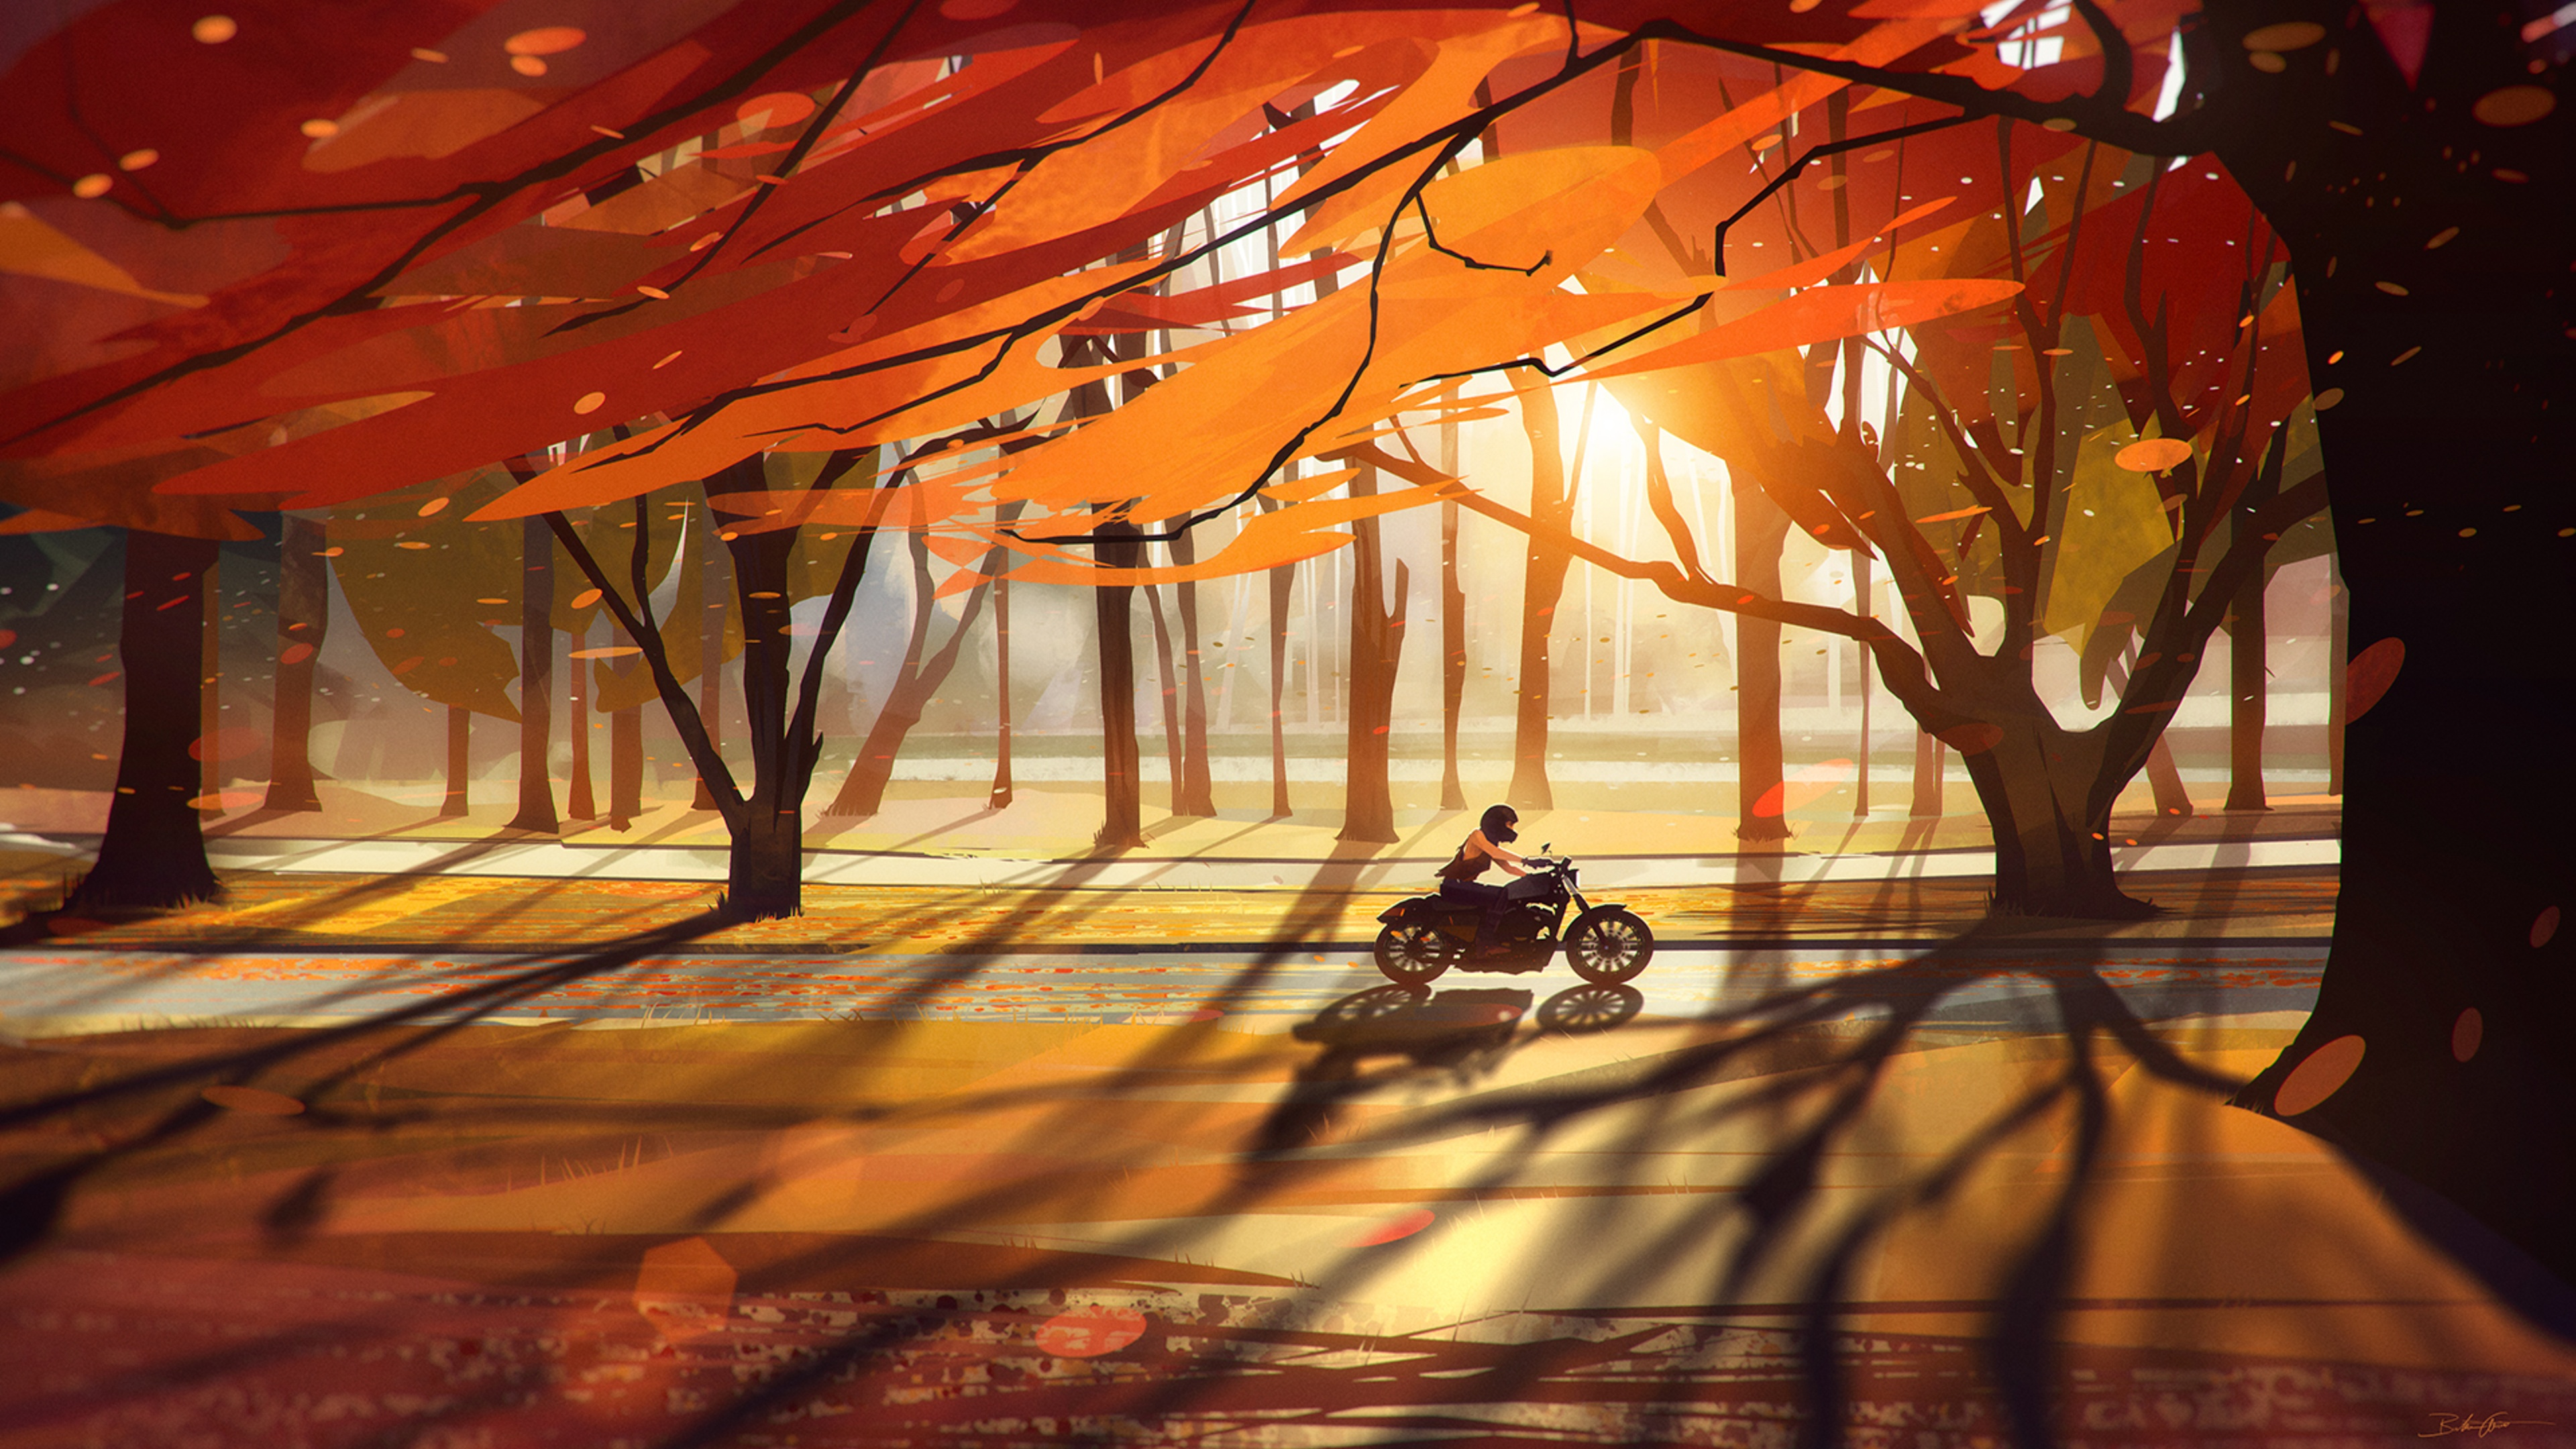 Fall Art best background